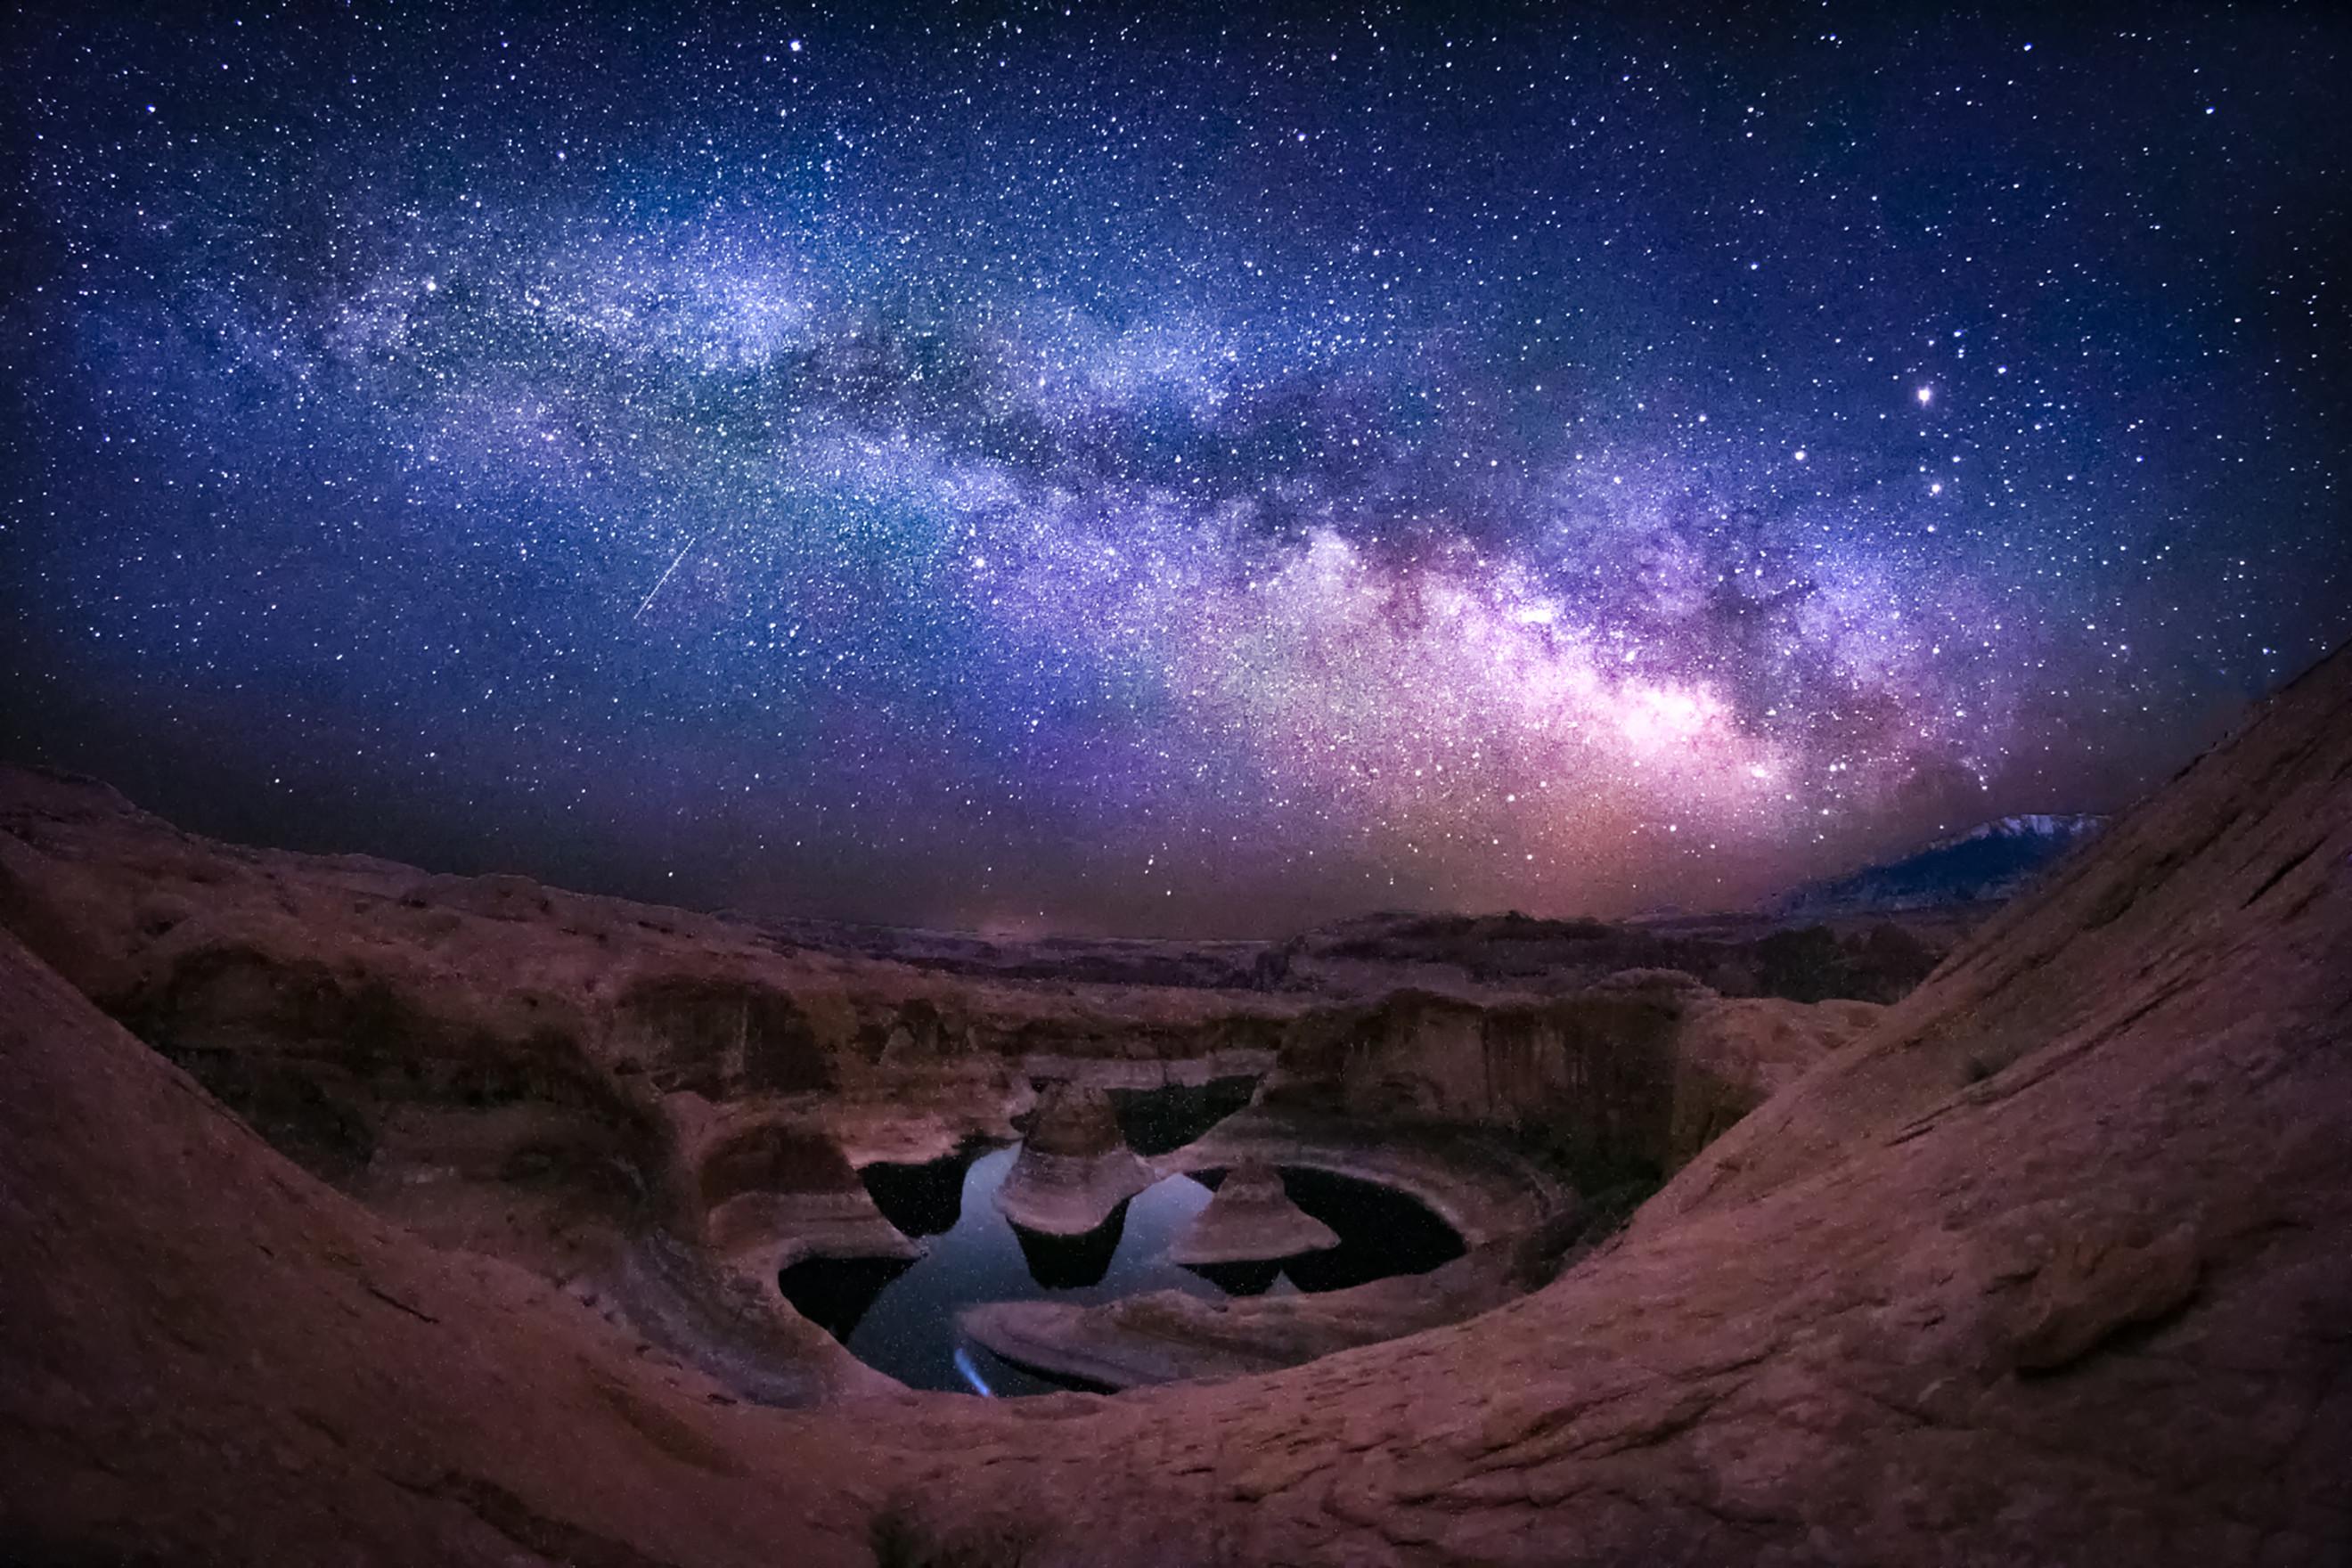 Milky Way reflection by Sarah Shumaker